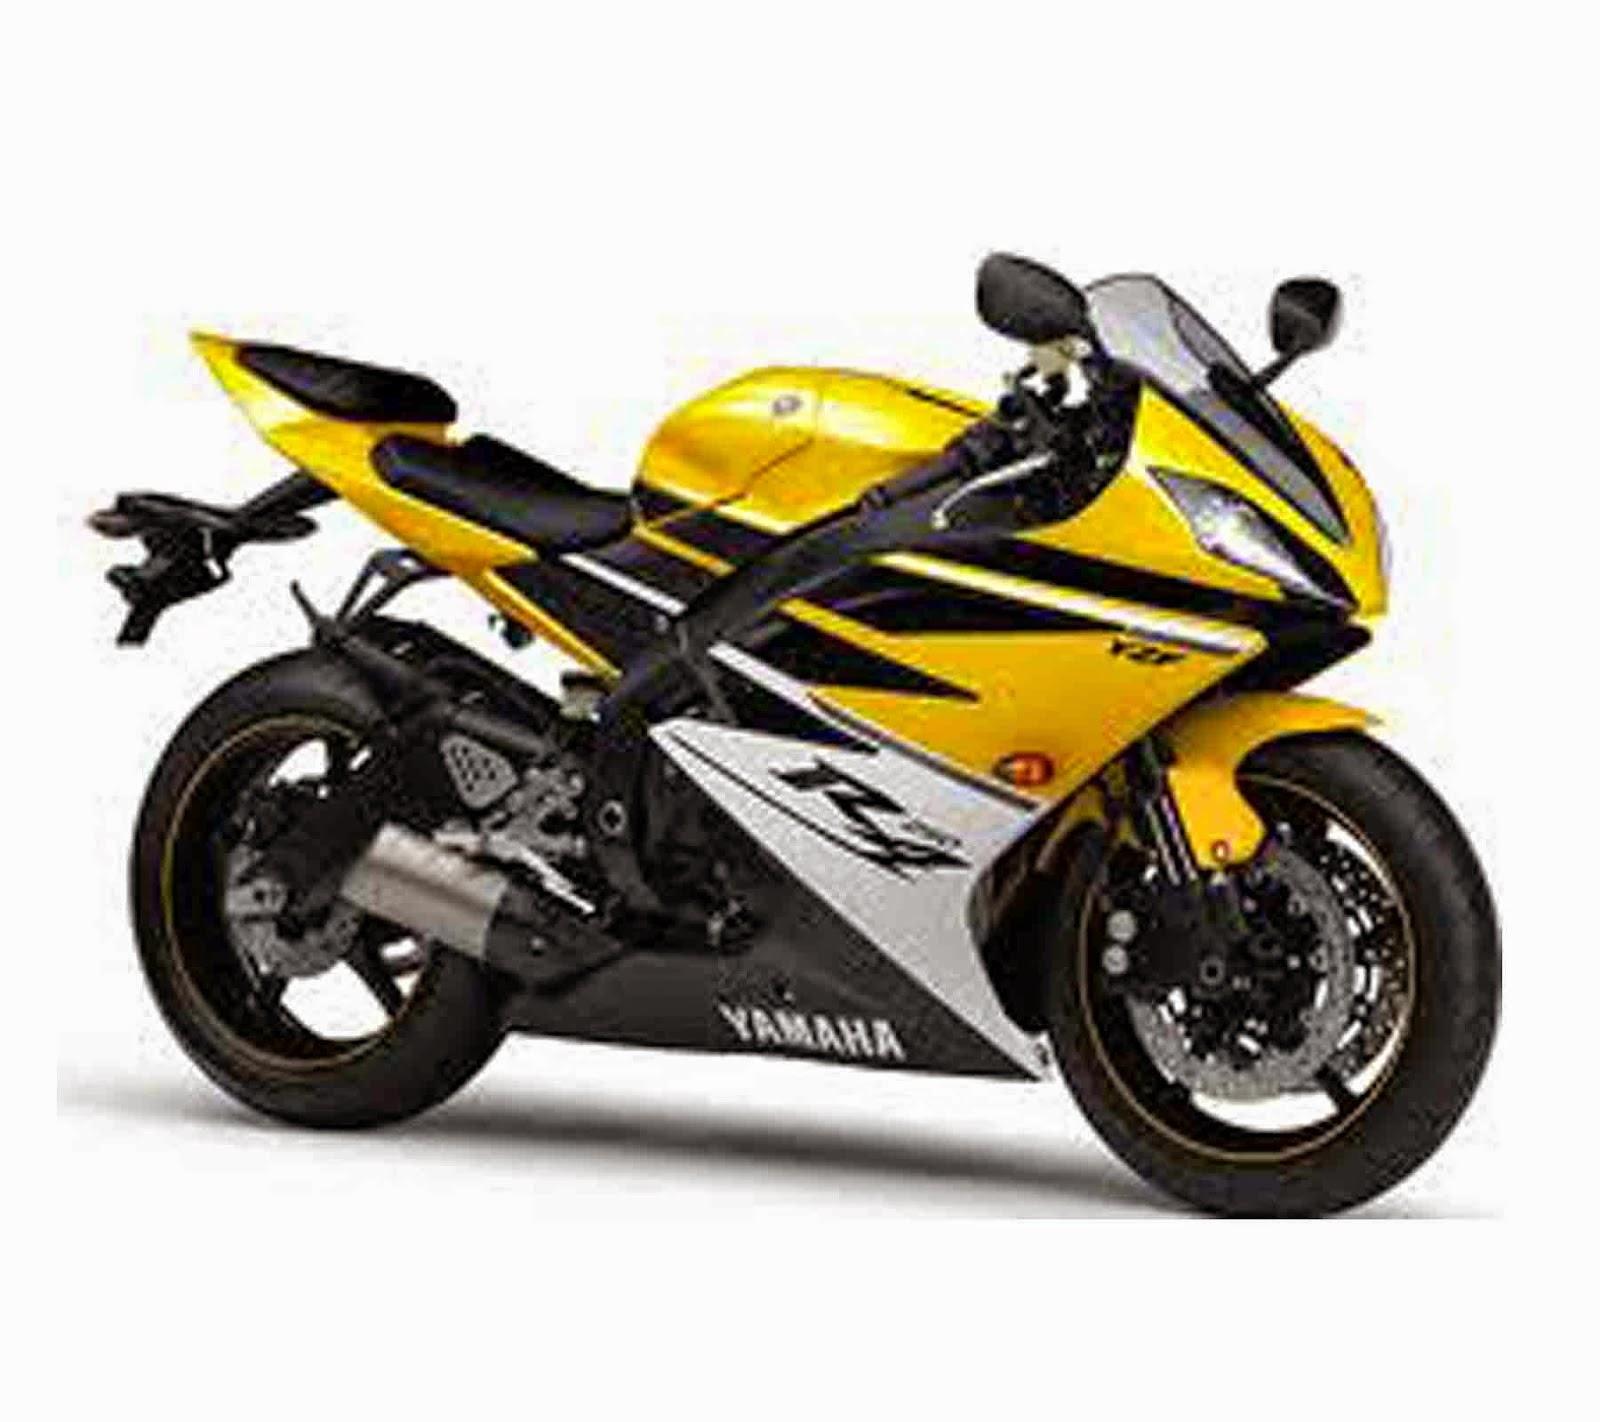 107 Modif Motor Honda Cbr 150 Cc Modifikasi Motor Honda CB Terbaru